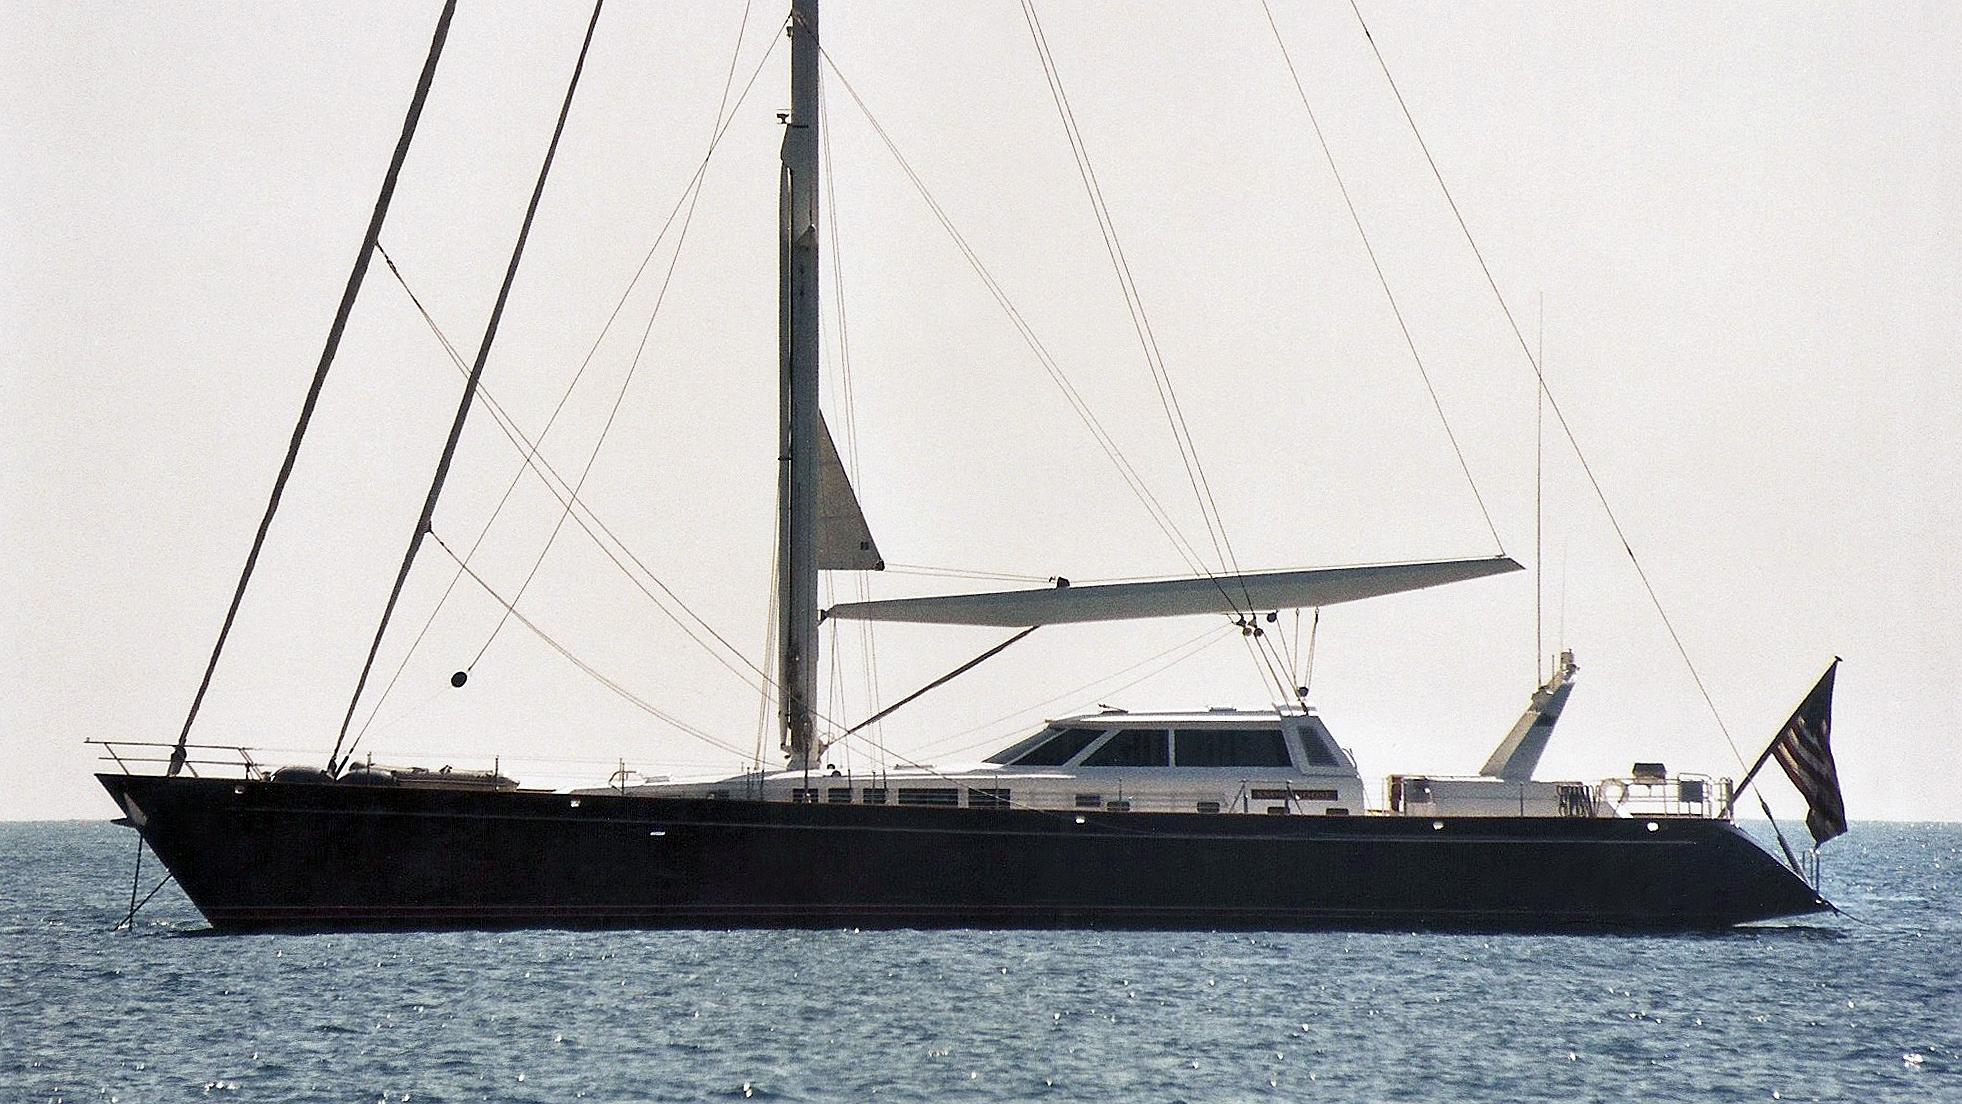 snowgoose-ii-sailing-yacht-insark-marine-us-1993-35m-profile